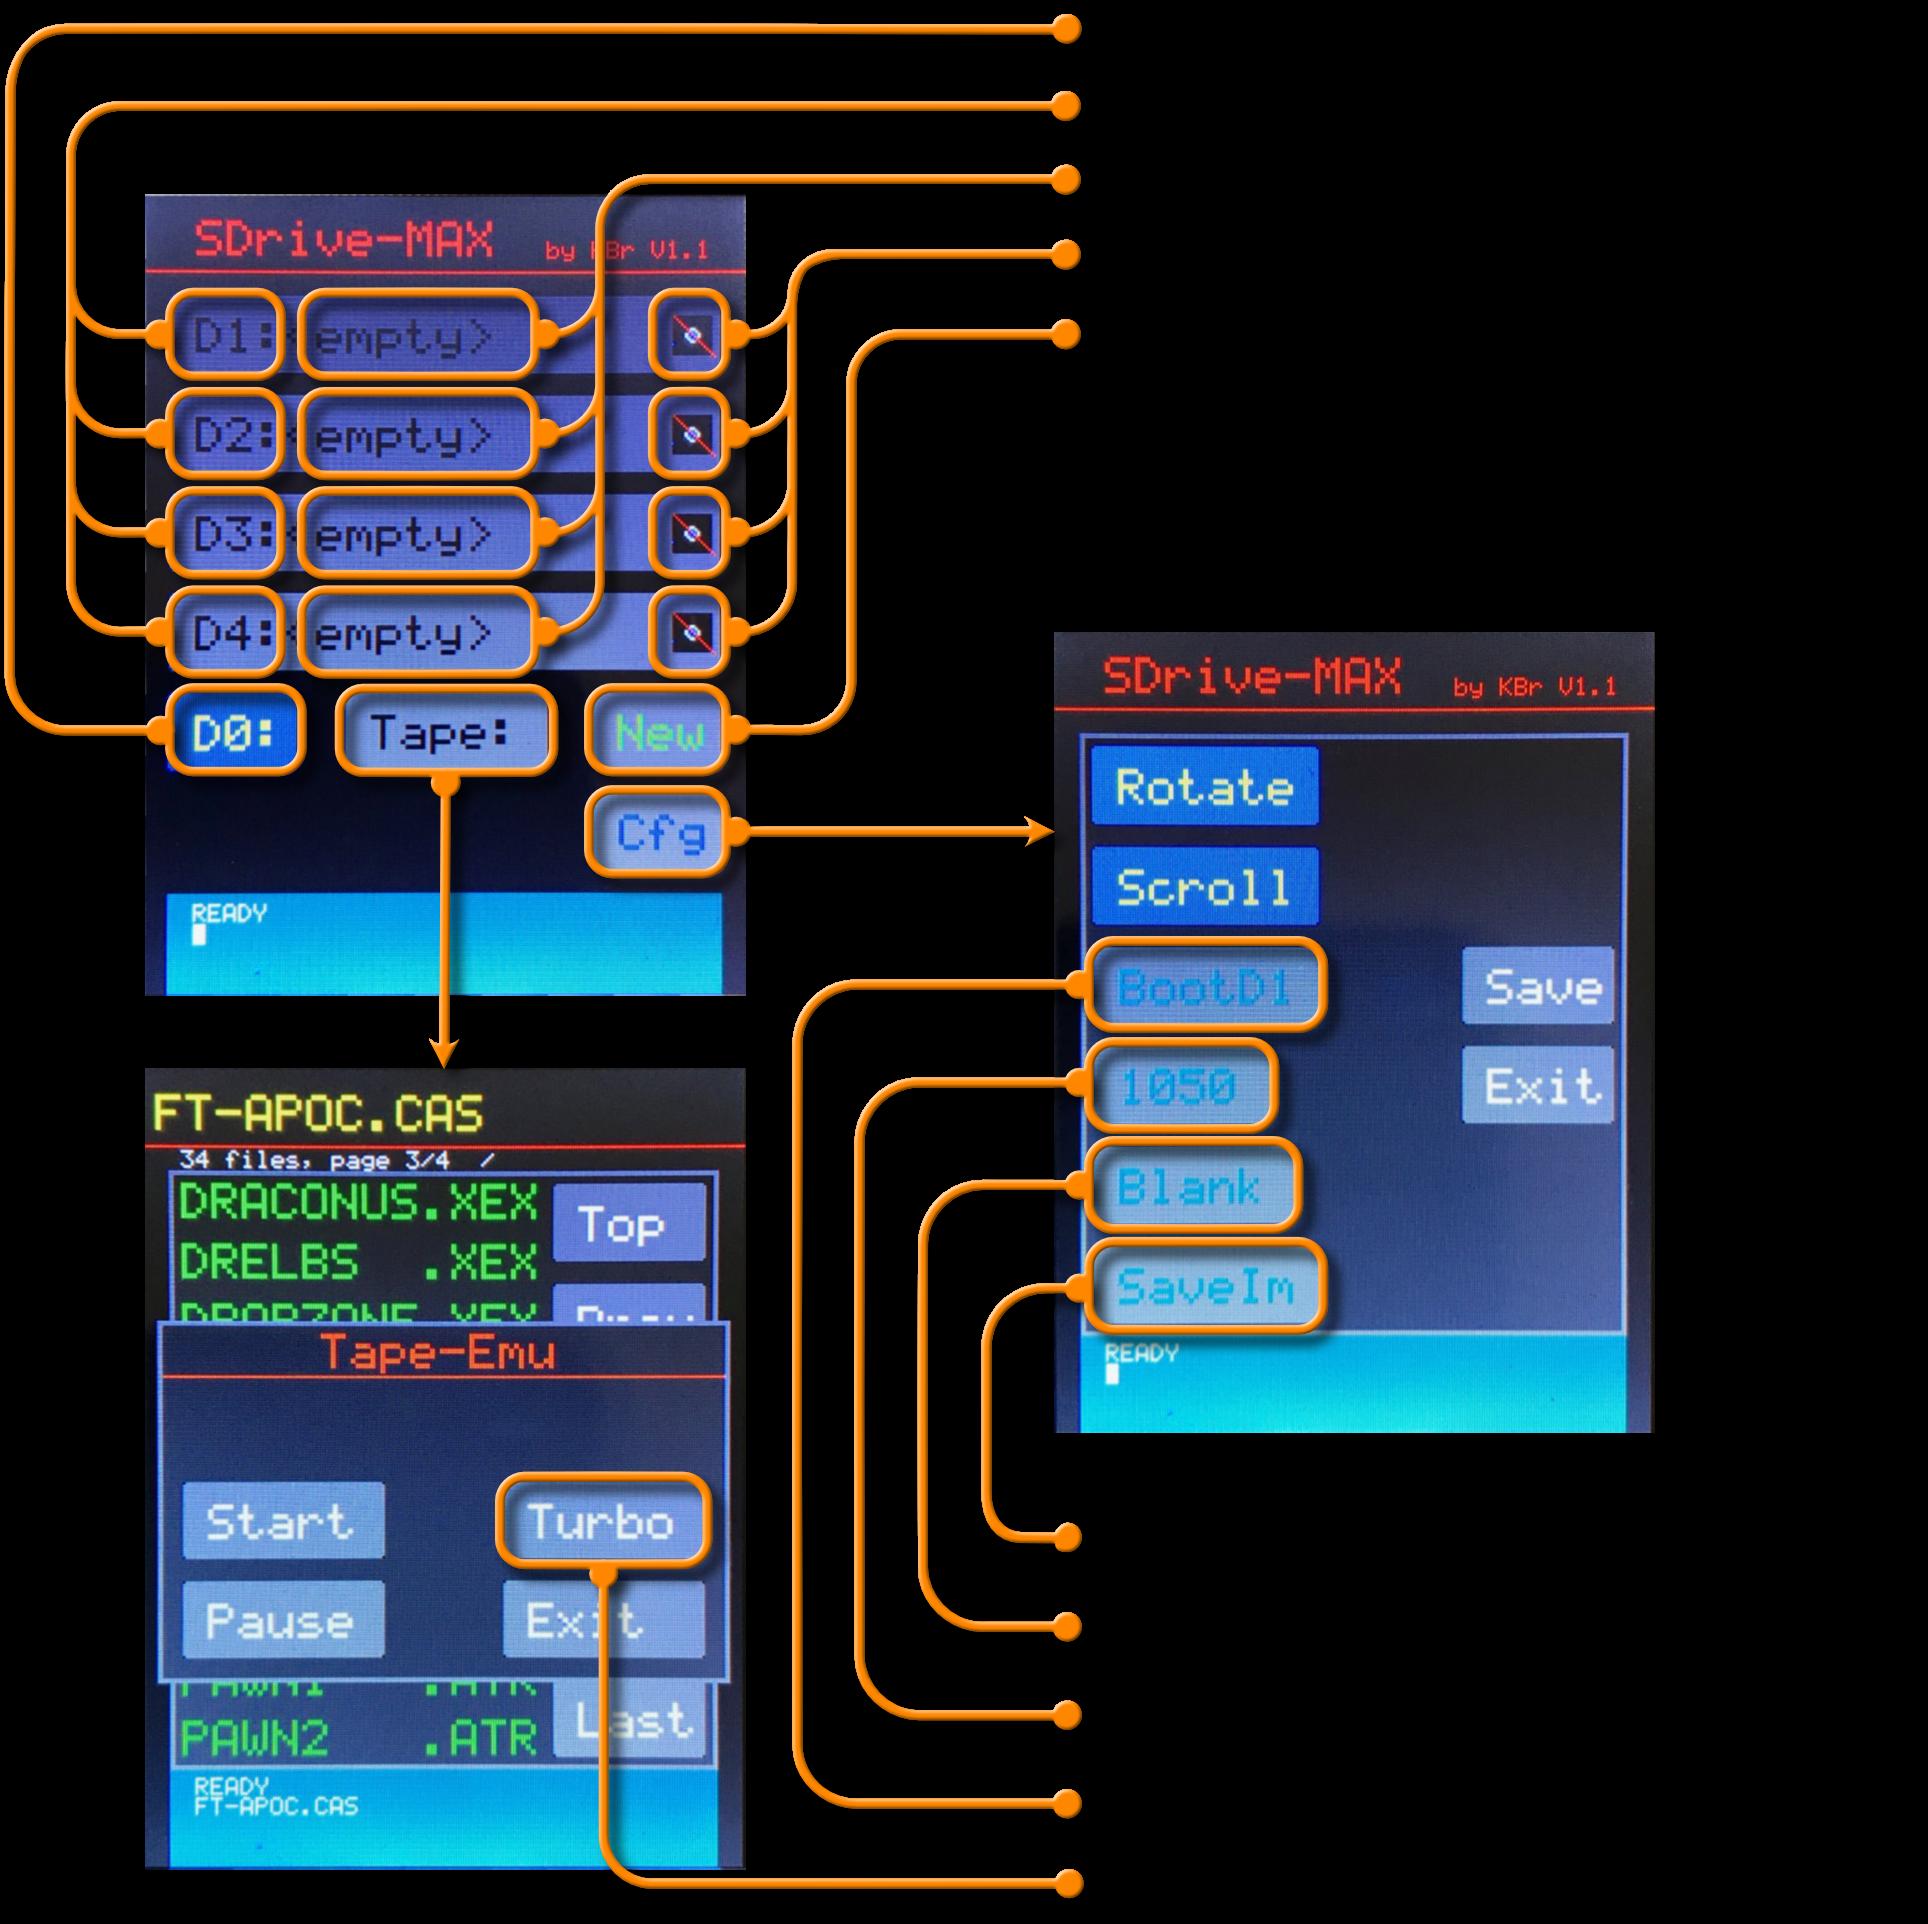 Everything SDrive-MAX – Atari 8Bit